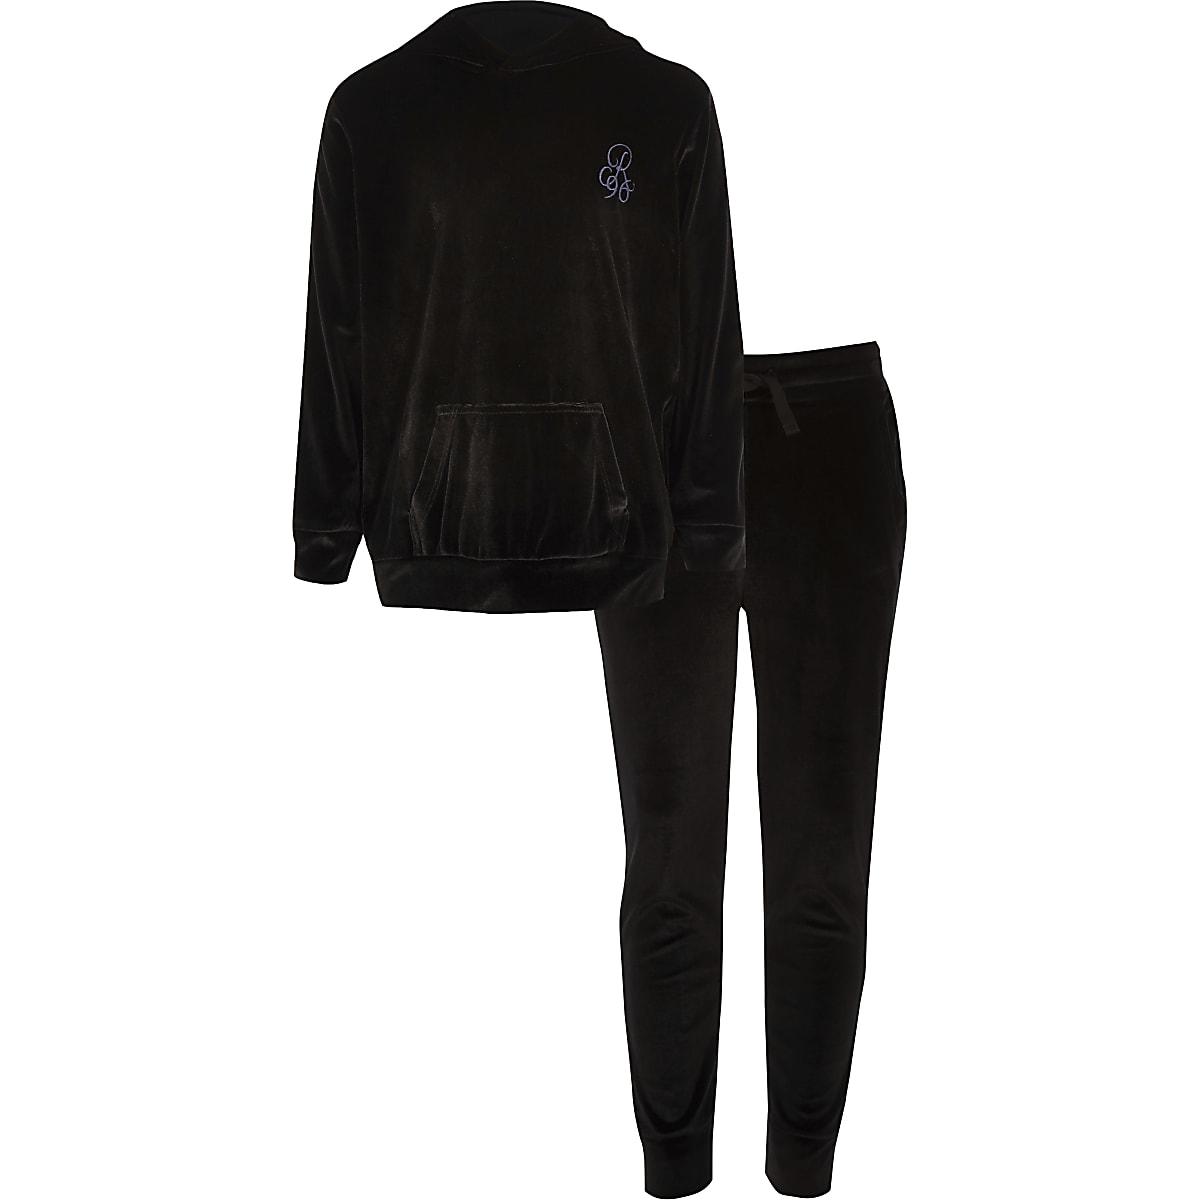 Boys black velour R96 hoodie outfit